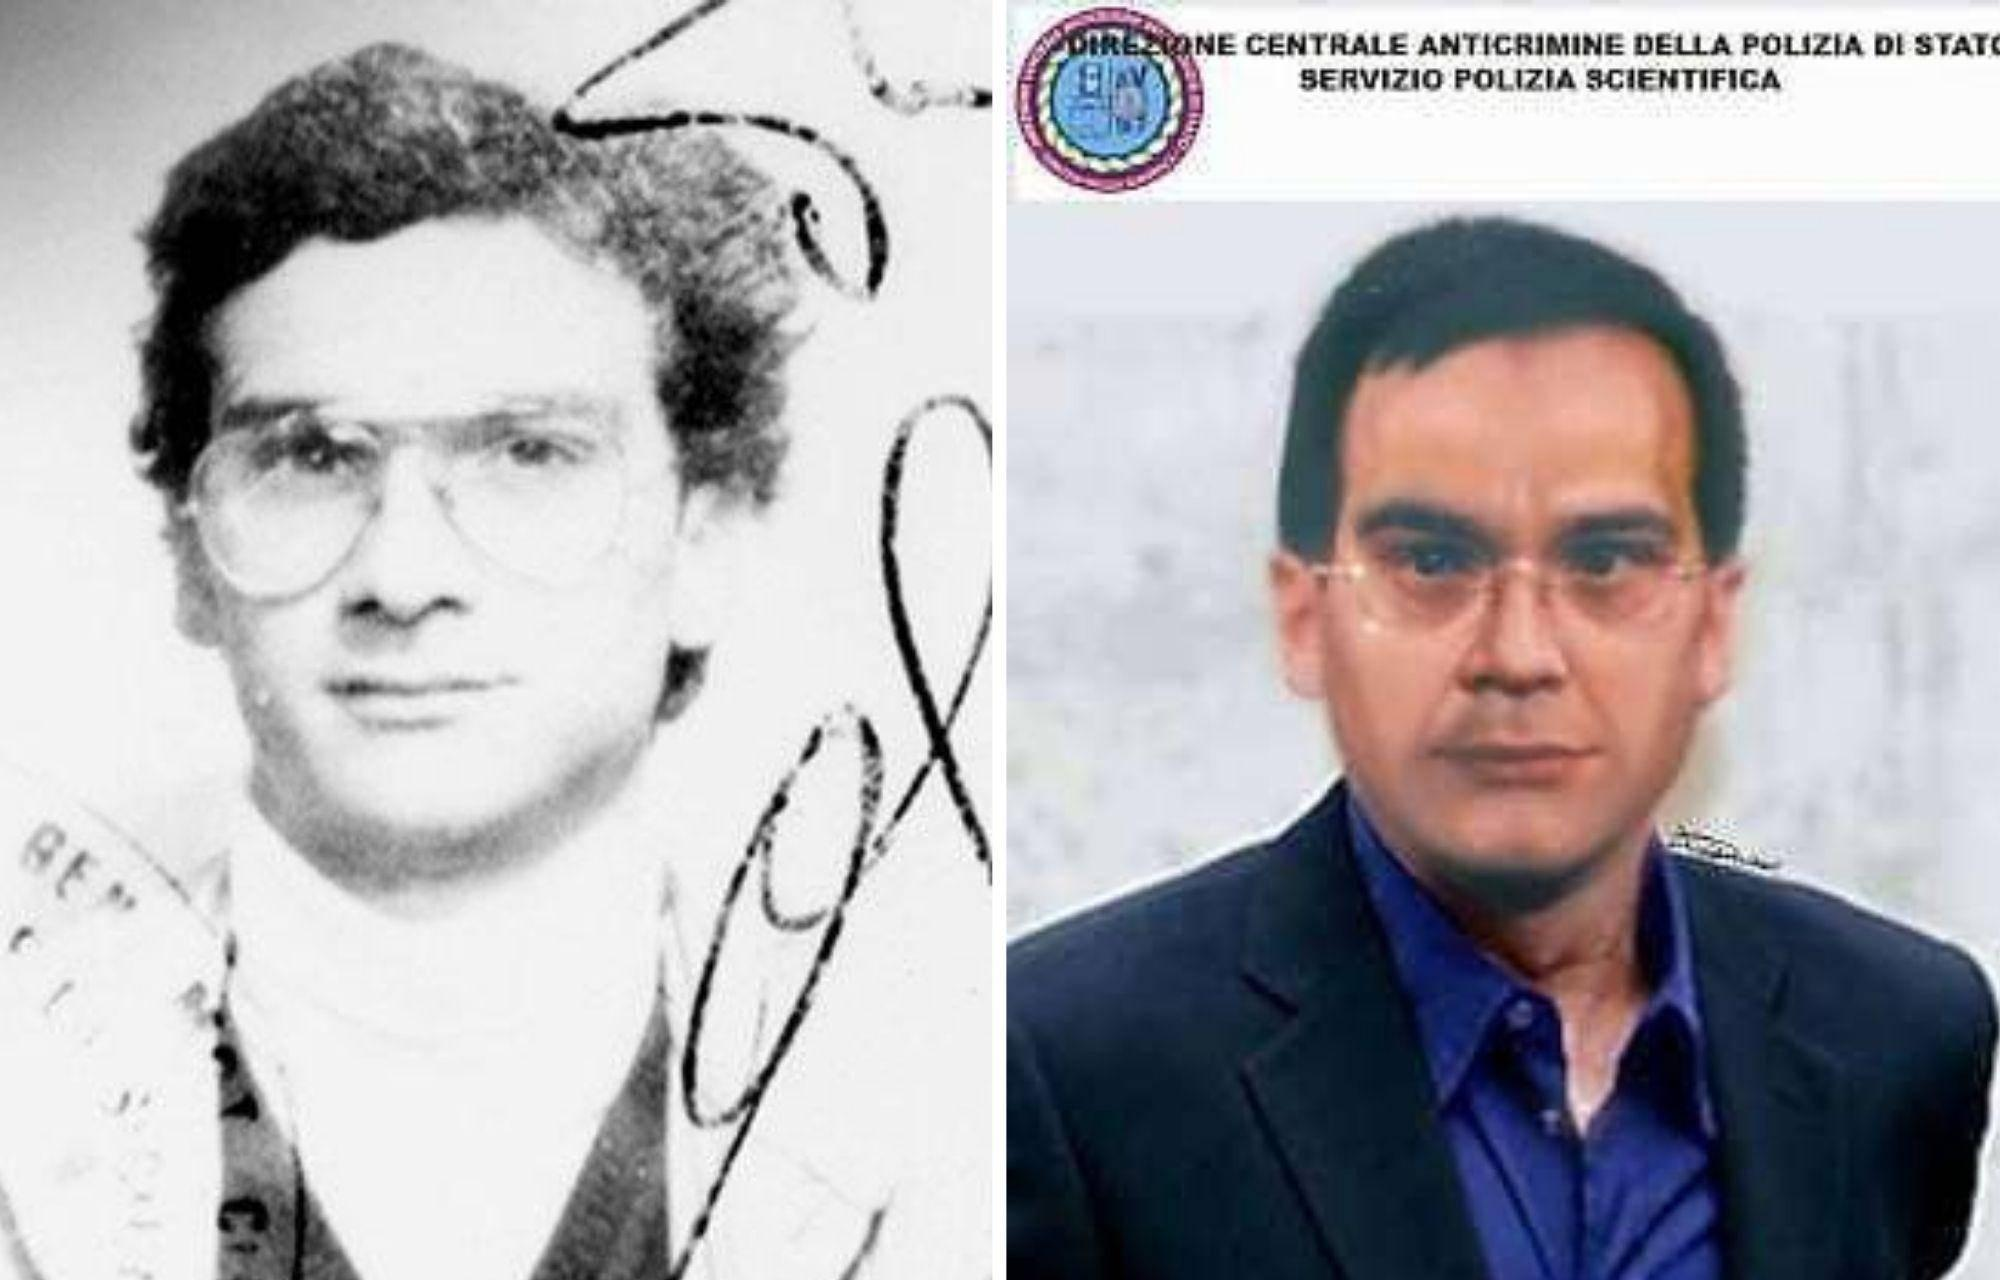 "Слева — фото Денаро на его водительском удостоверении, справа — фоторобот Денаро, ""состаренного"" на 20 лет. Фото © Wikimedia Commons"